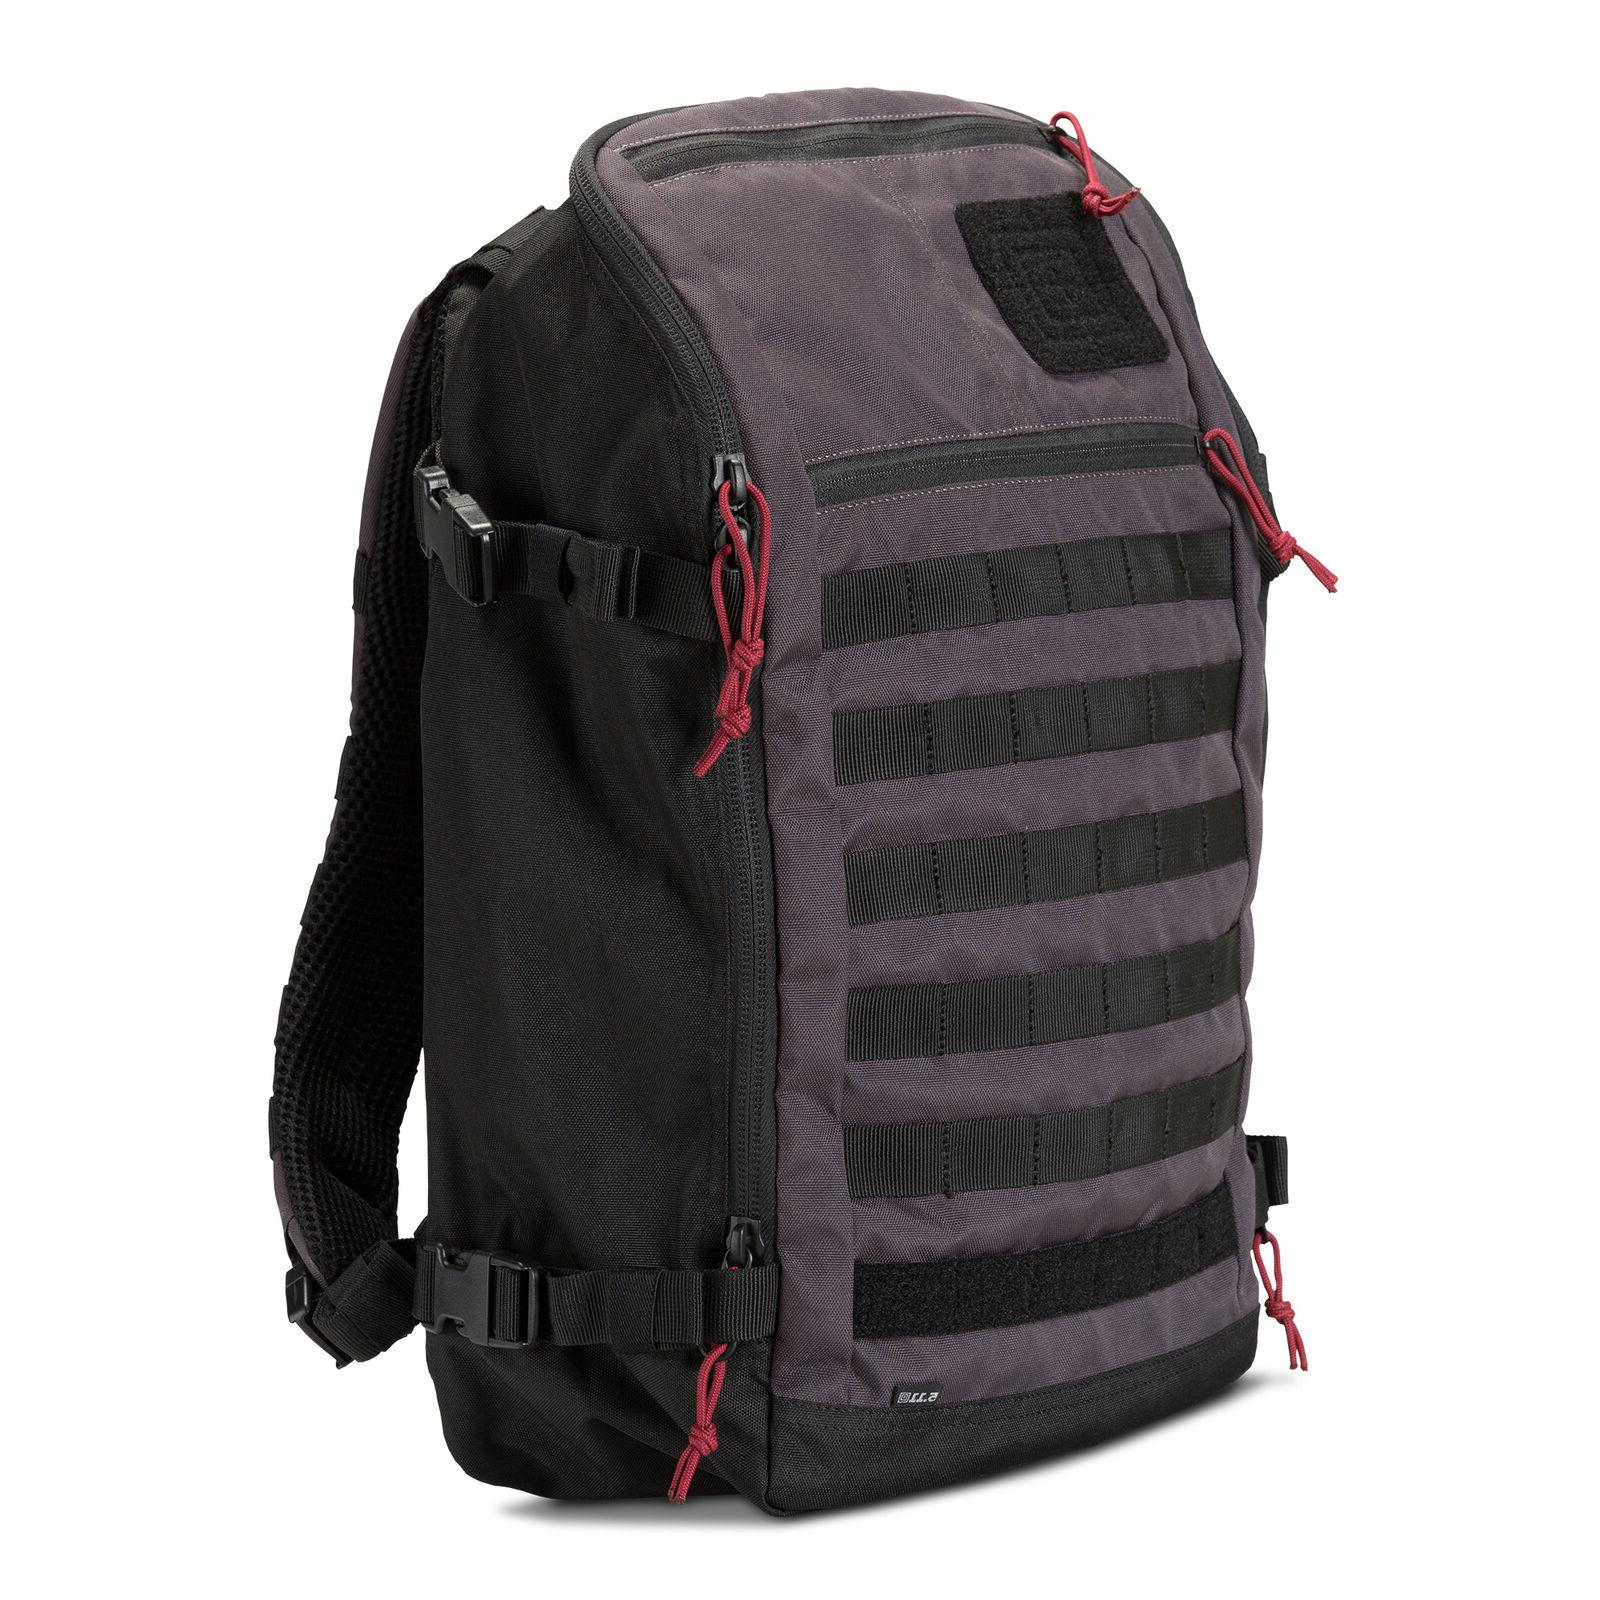 5.11 / Tactical Outdoor Bag